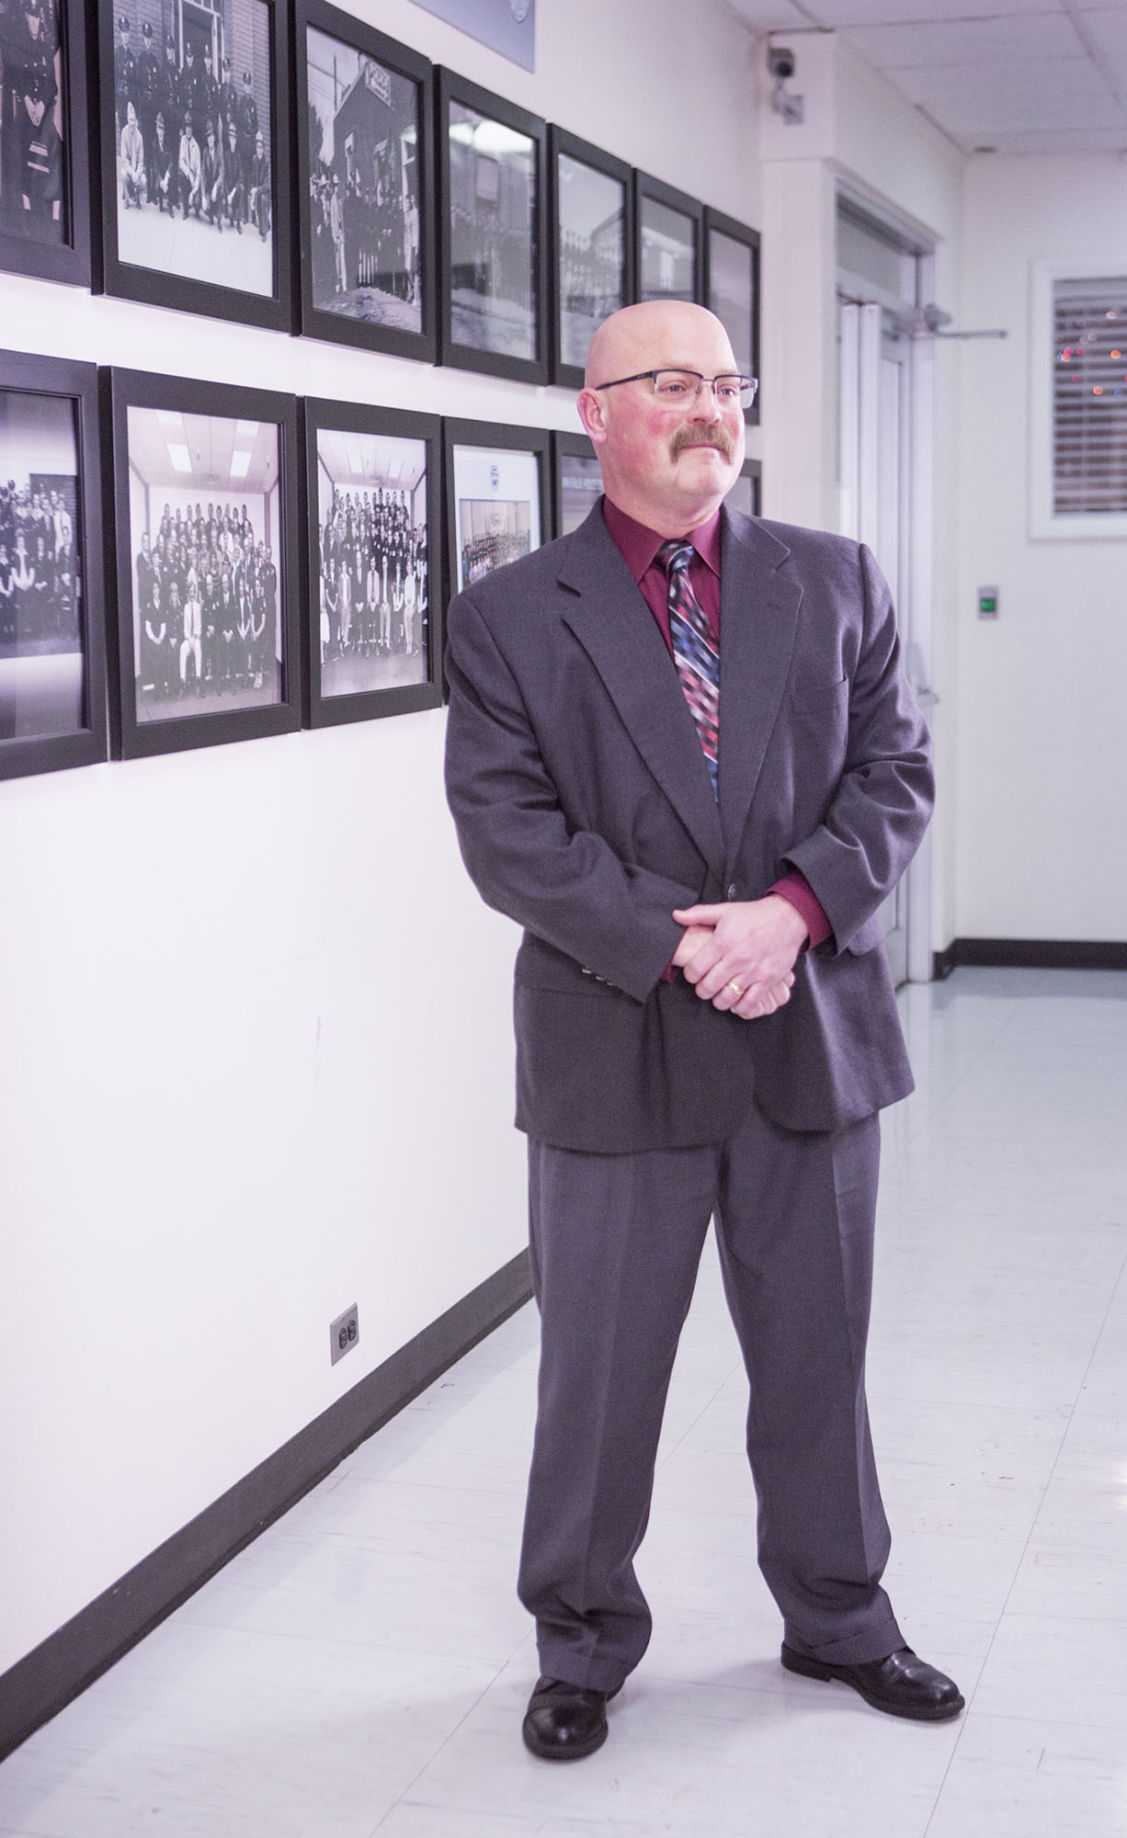 Police Chief Craig Kingsbury